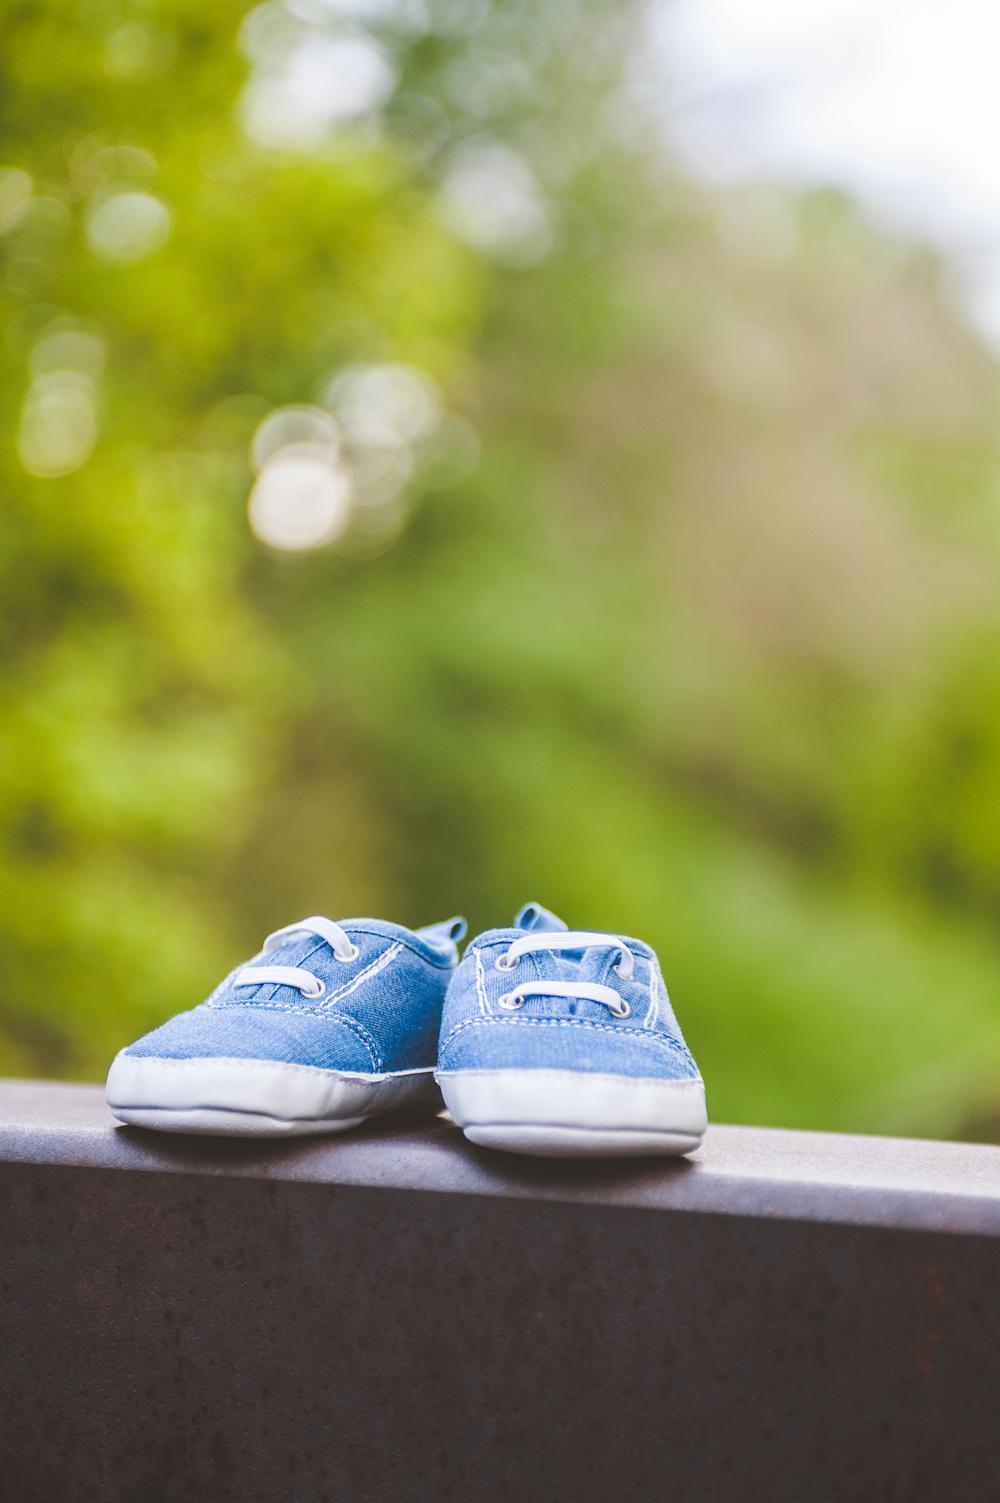 ck-Colorado-Maternity-Baby-Photography-0002.jpg